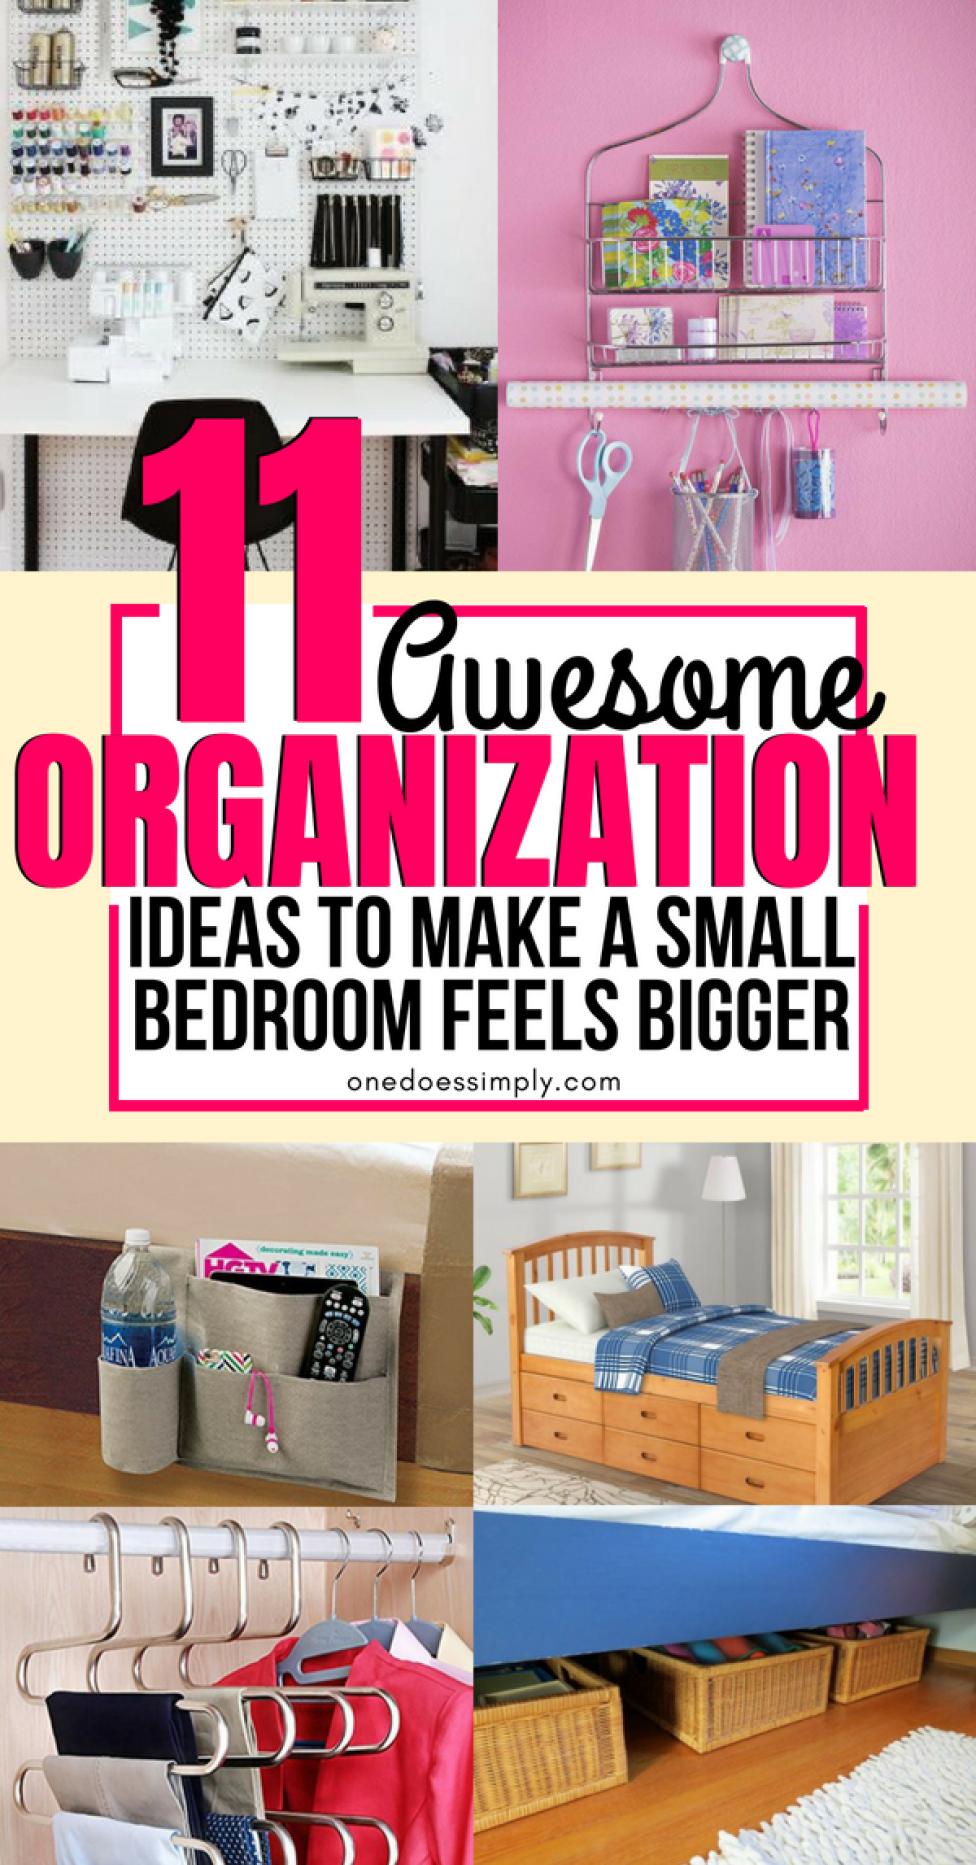 11 Genius Organization Hacks For Tiny Bedroom Small Bedroom Storage Bedroom Organization Diy Small Bedroom Organization